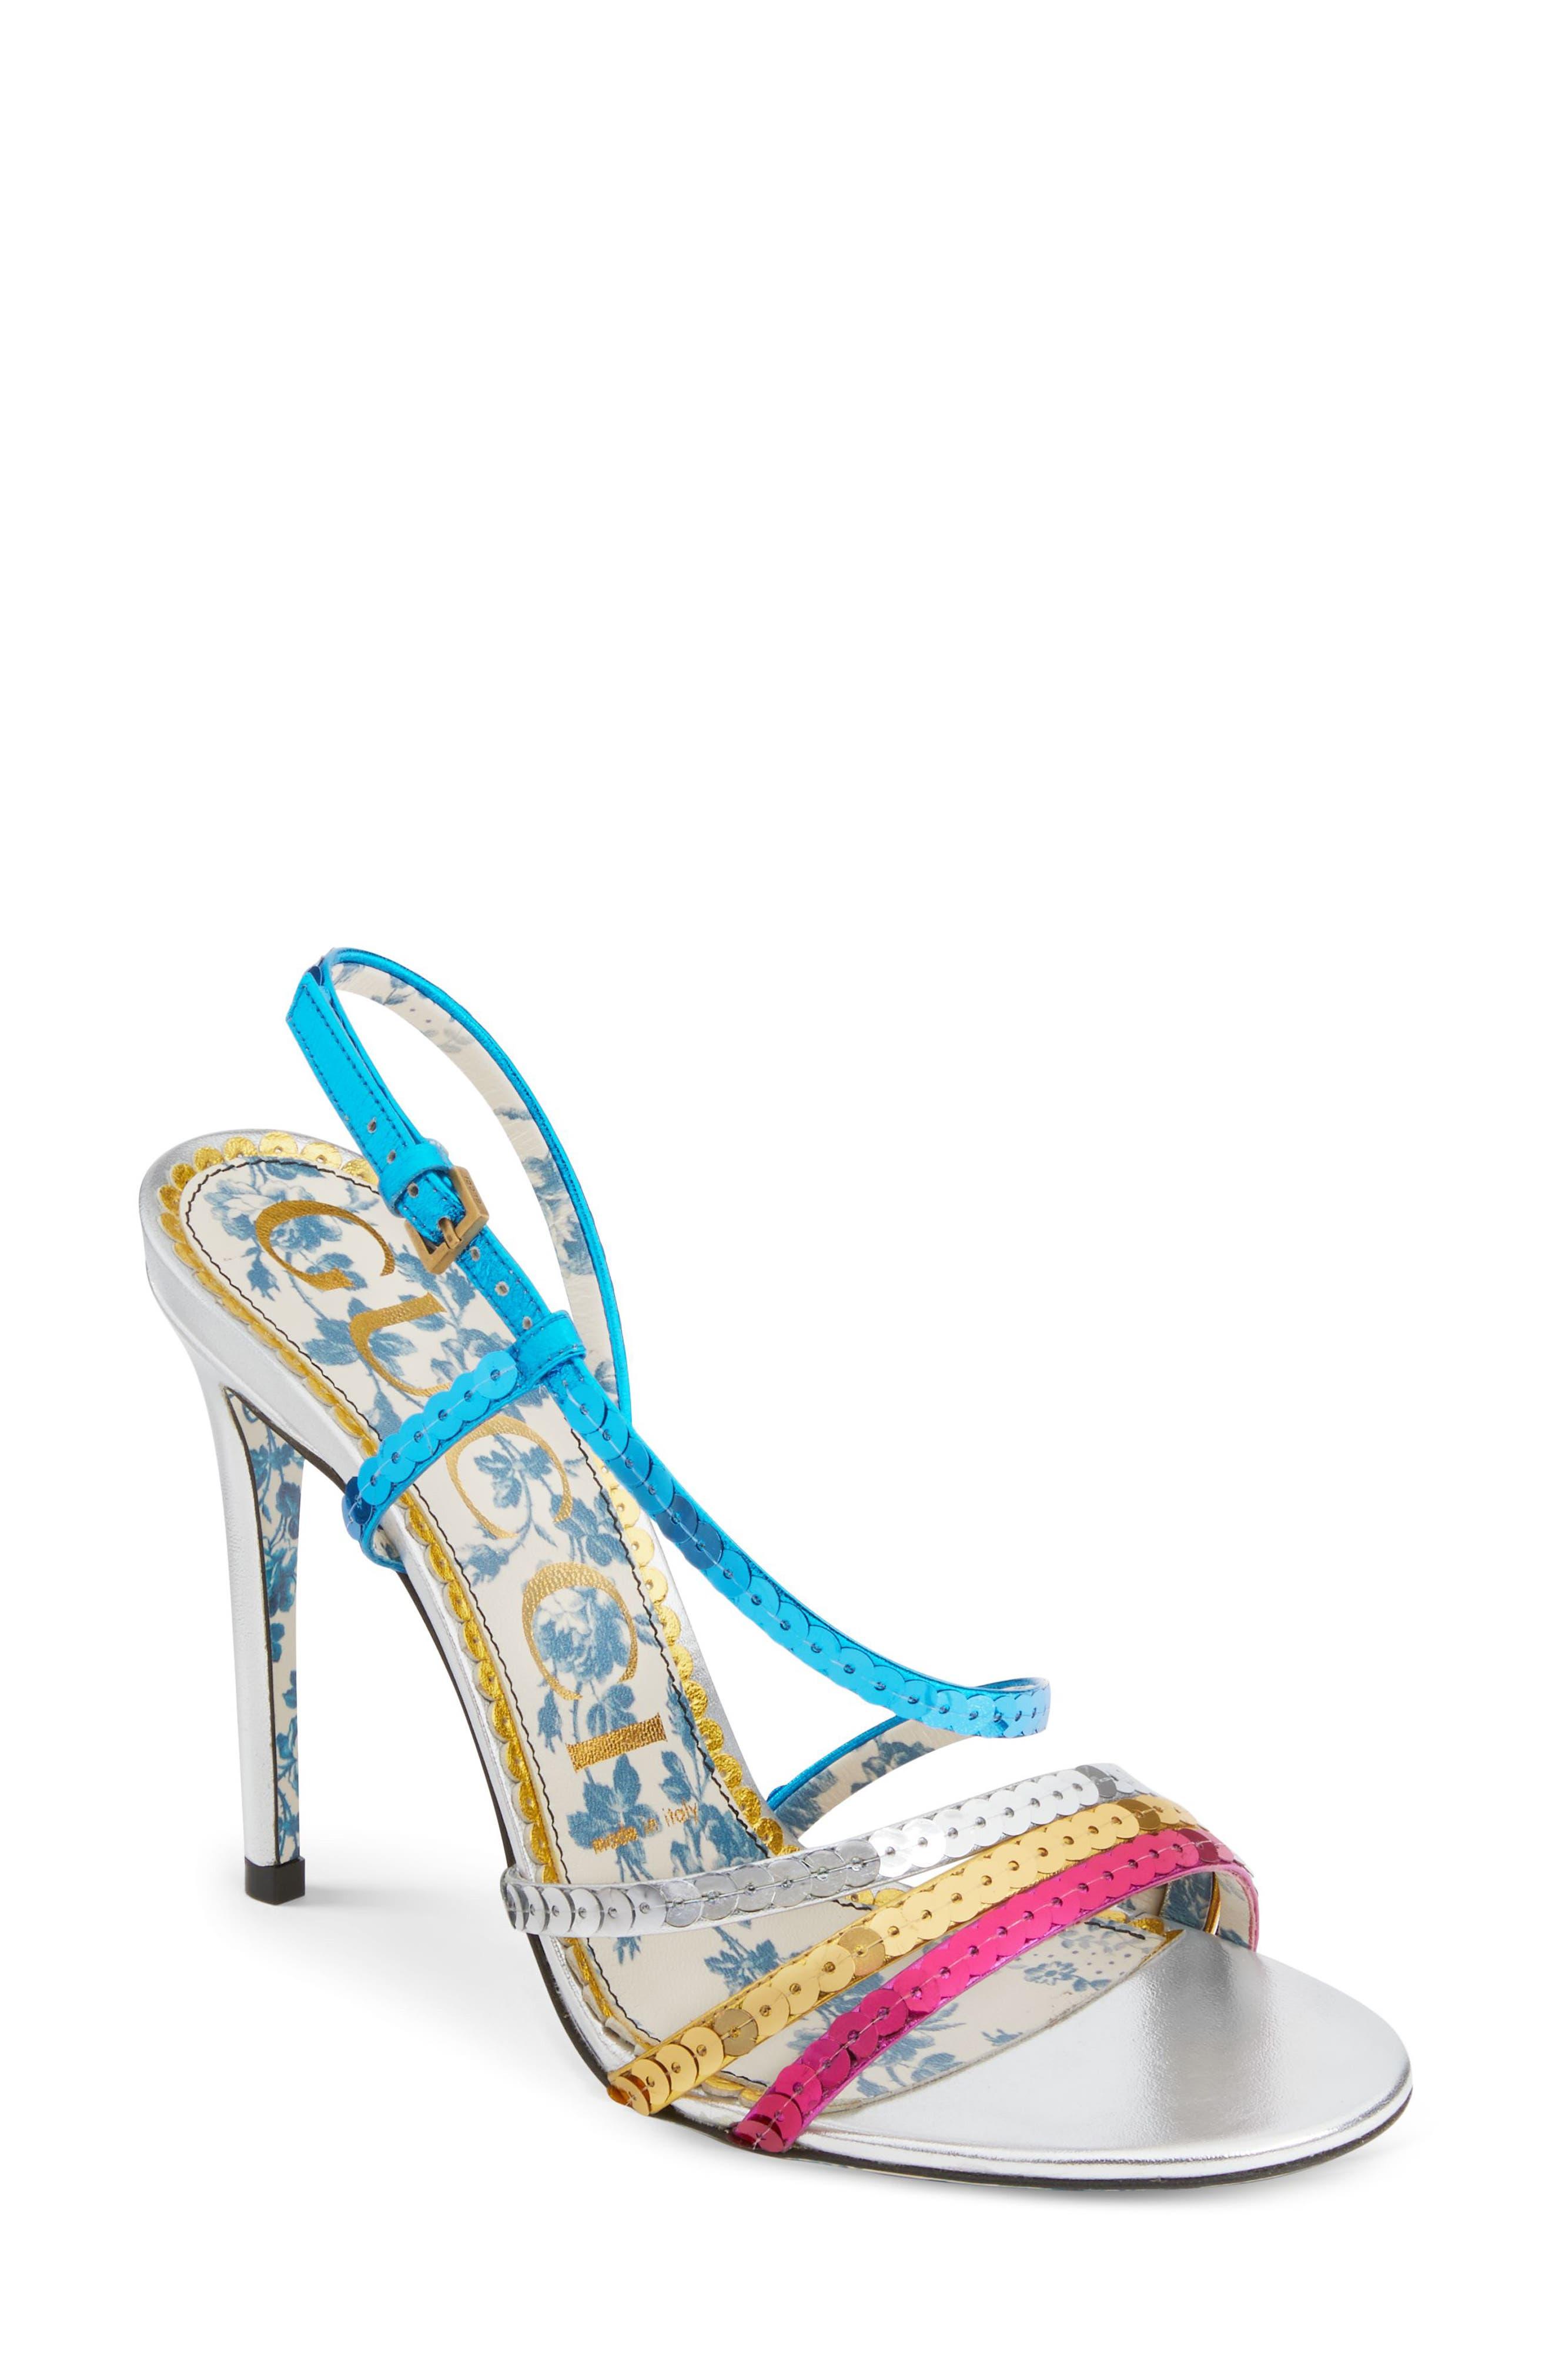 Sequin Sandal,                         Main,                         color, Silver/ Blue/ Pink